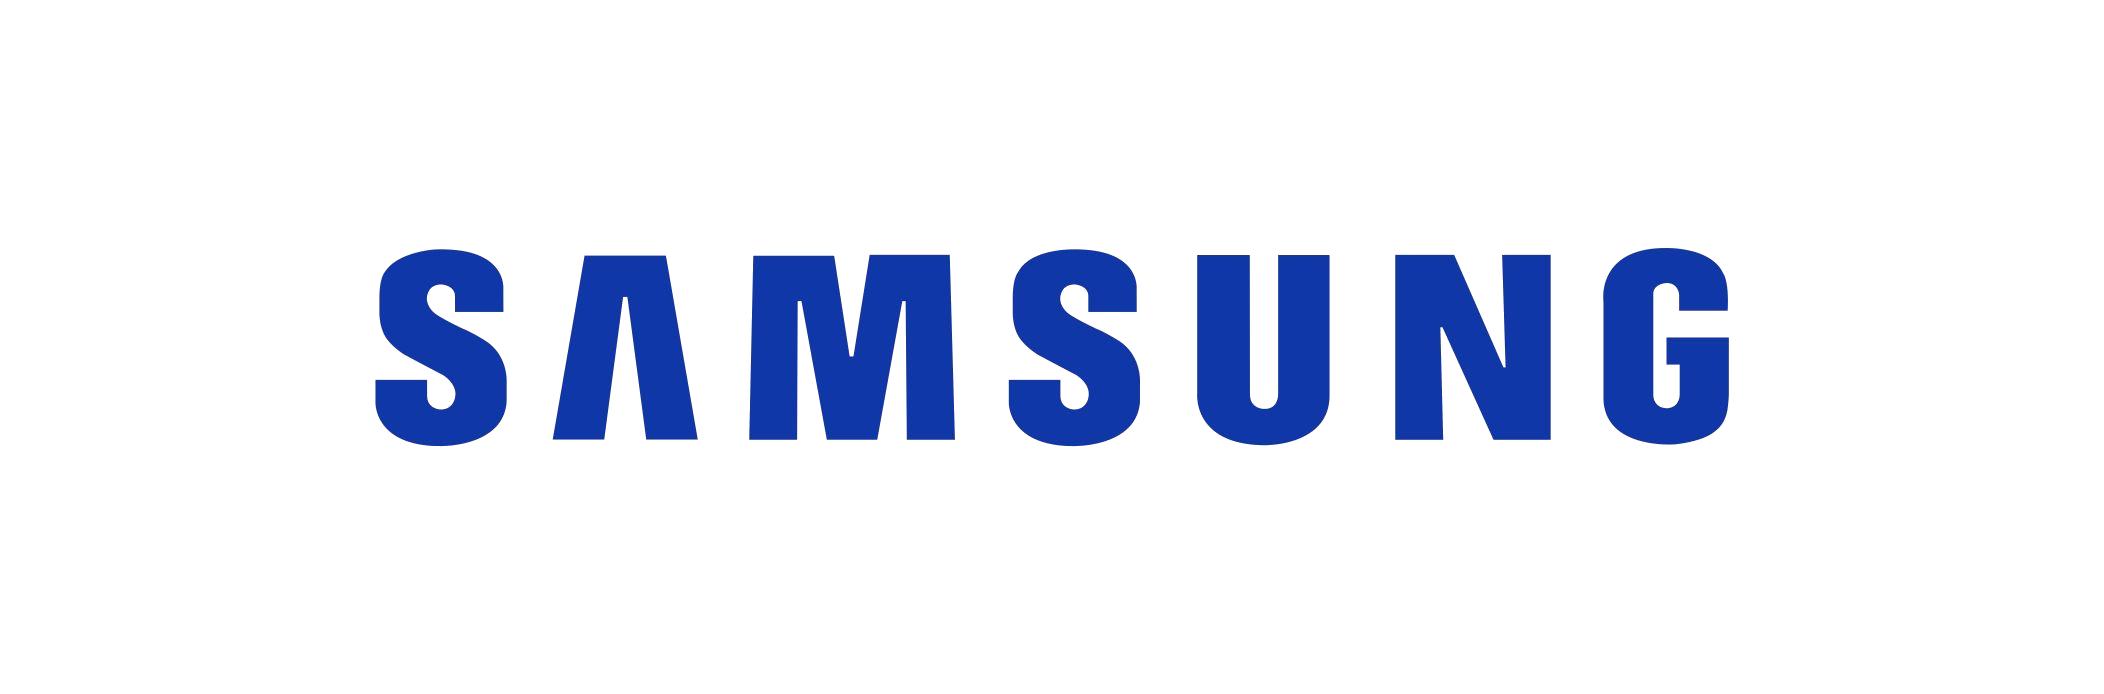 samsung-logo-png-samsung-logo-png-2104 - BGS Associés